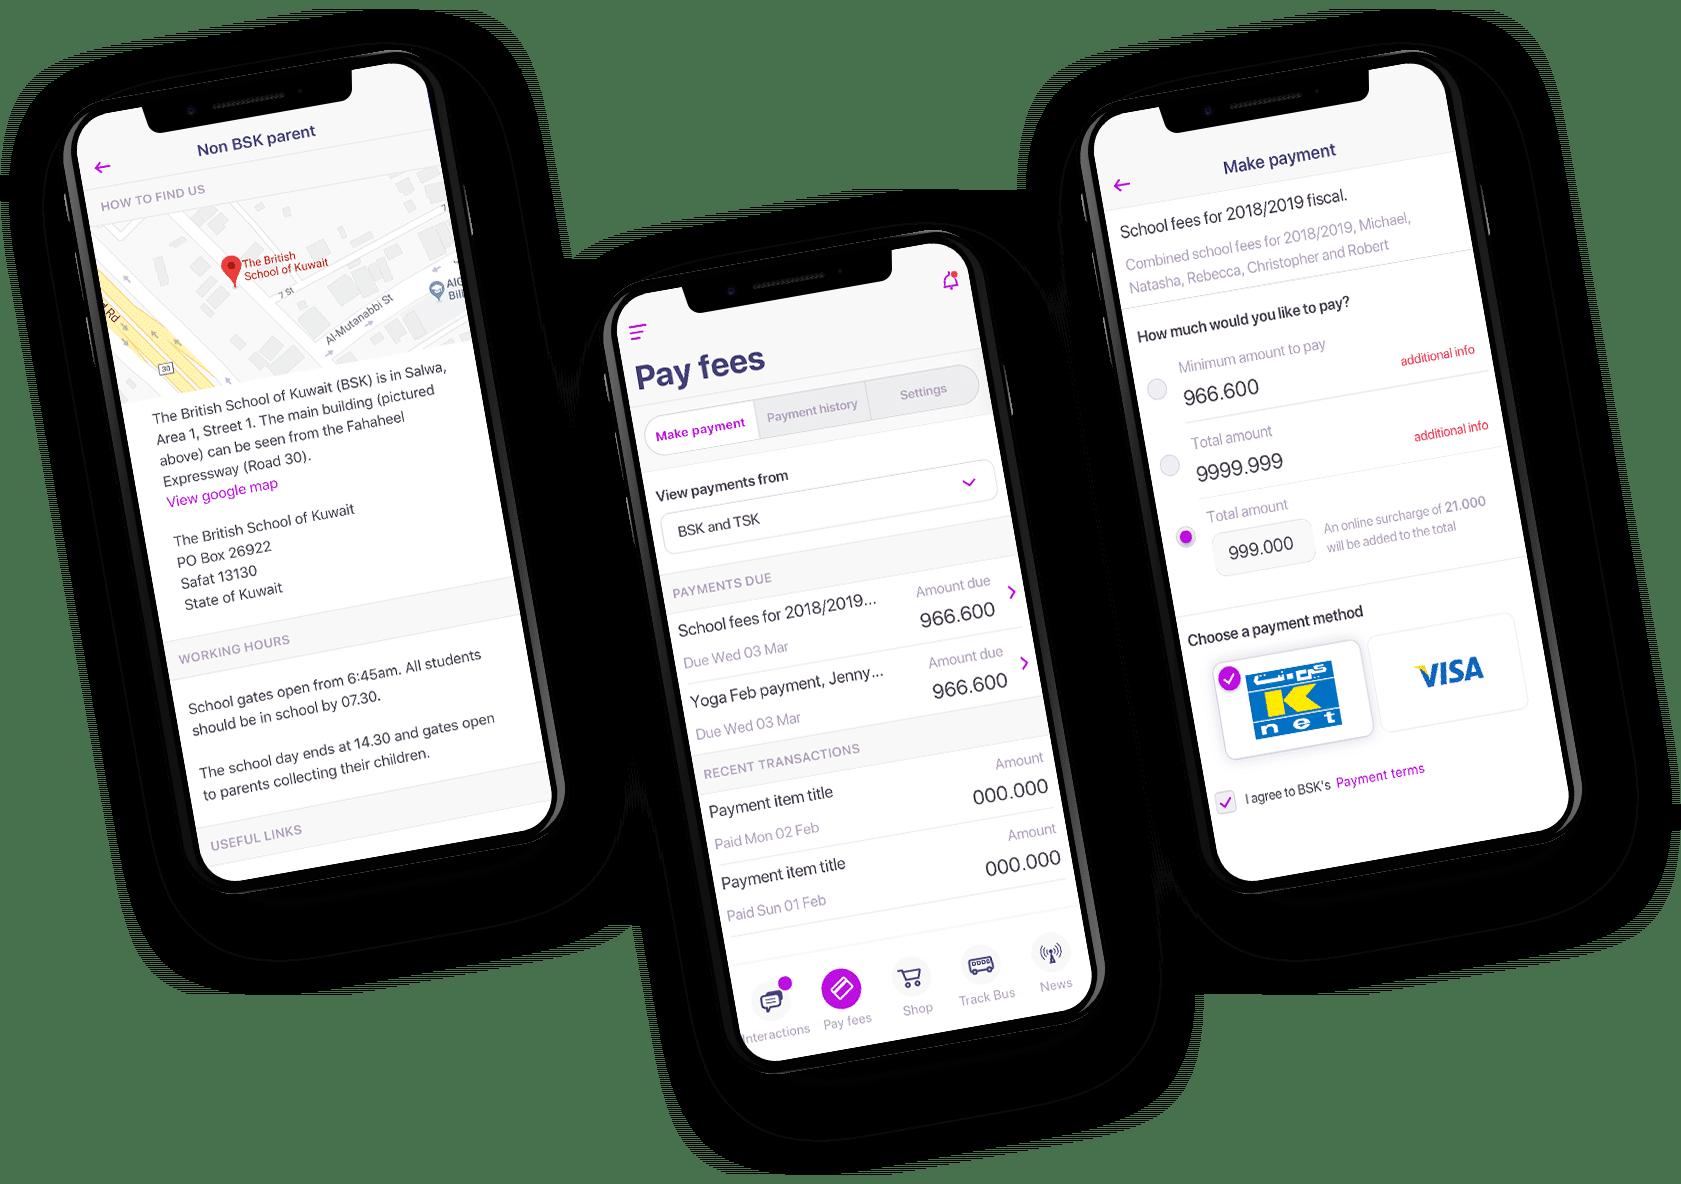 app related screen